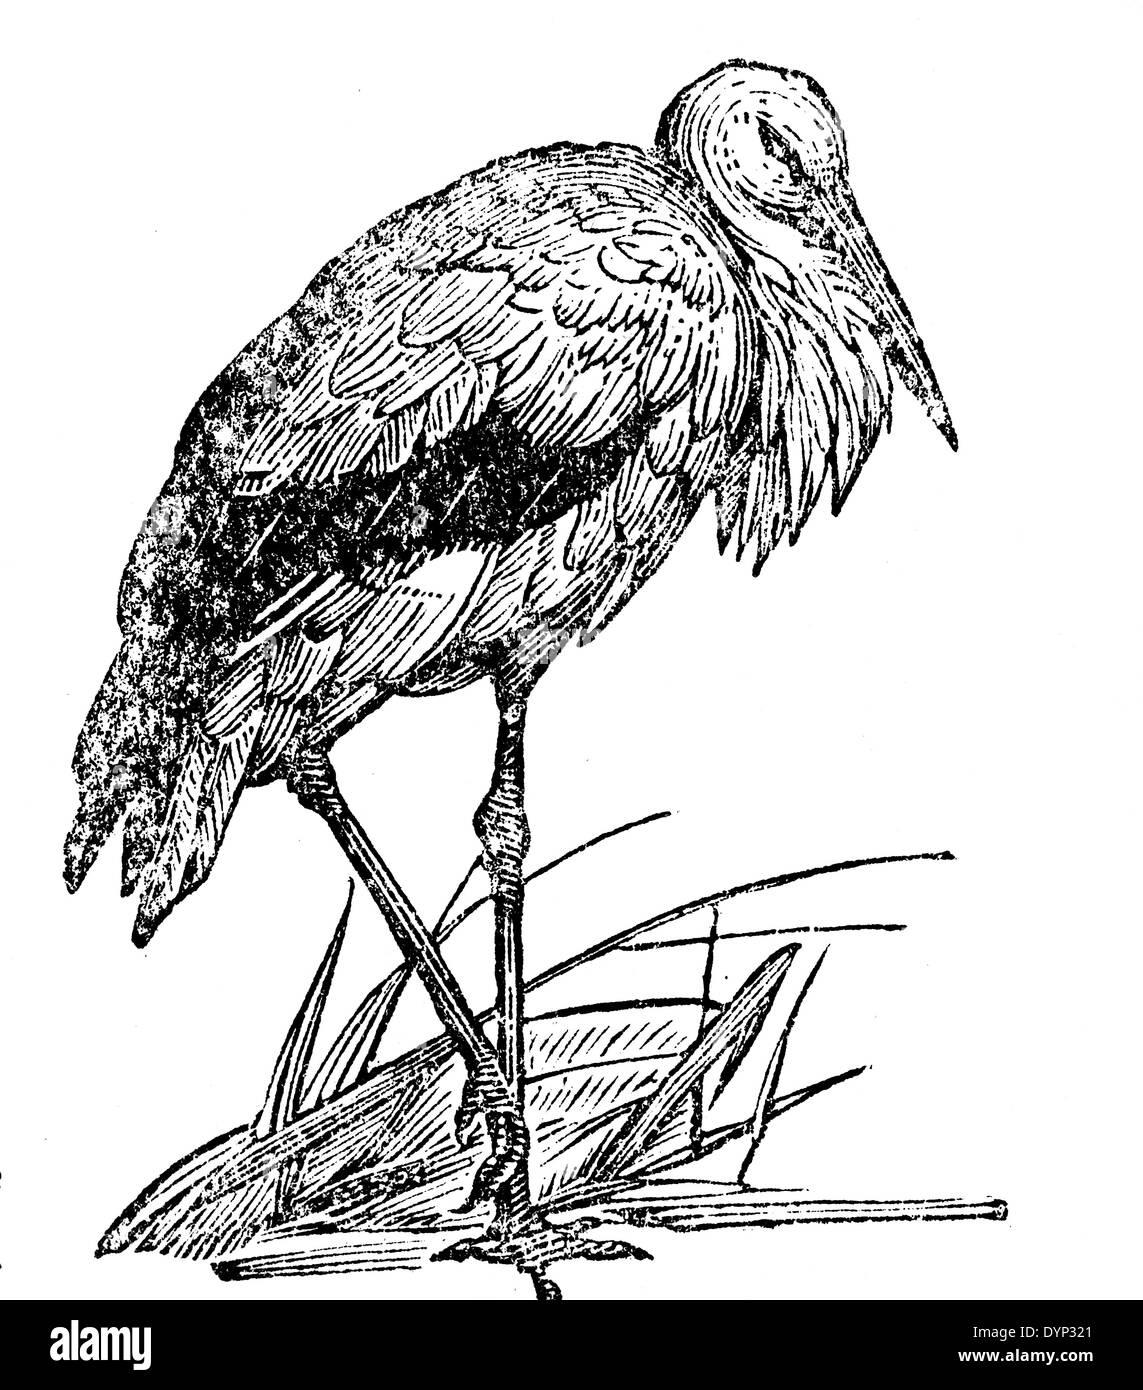 White Stork (Ciconia ciconia), illustration from Soviet encyclopedia, 1926 - Stock Image